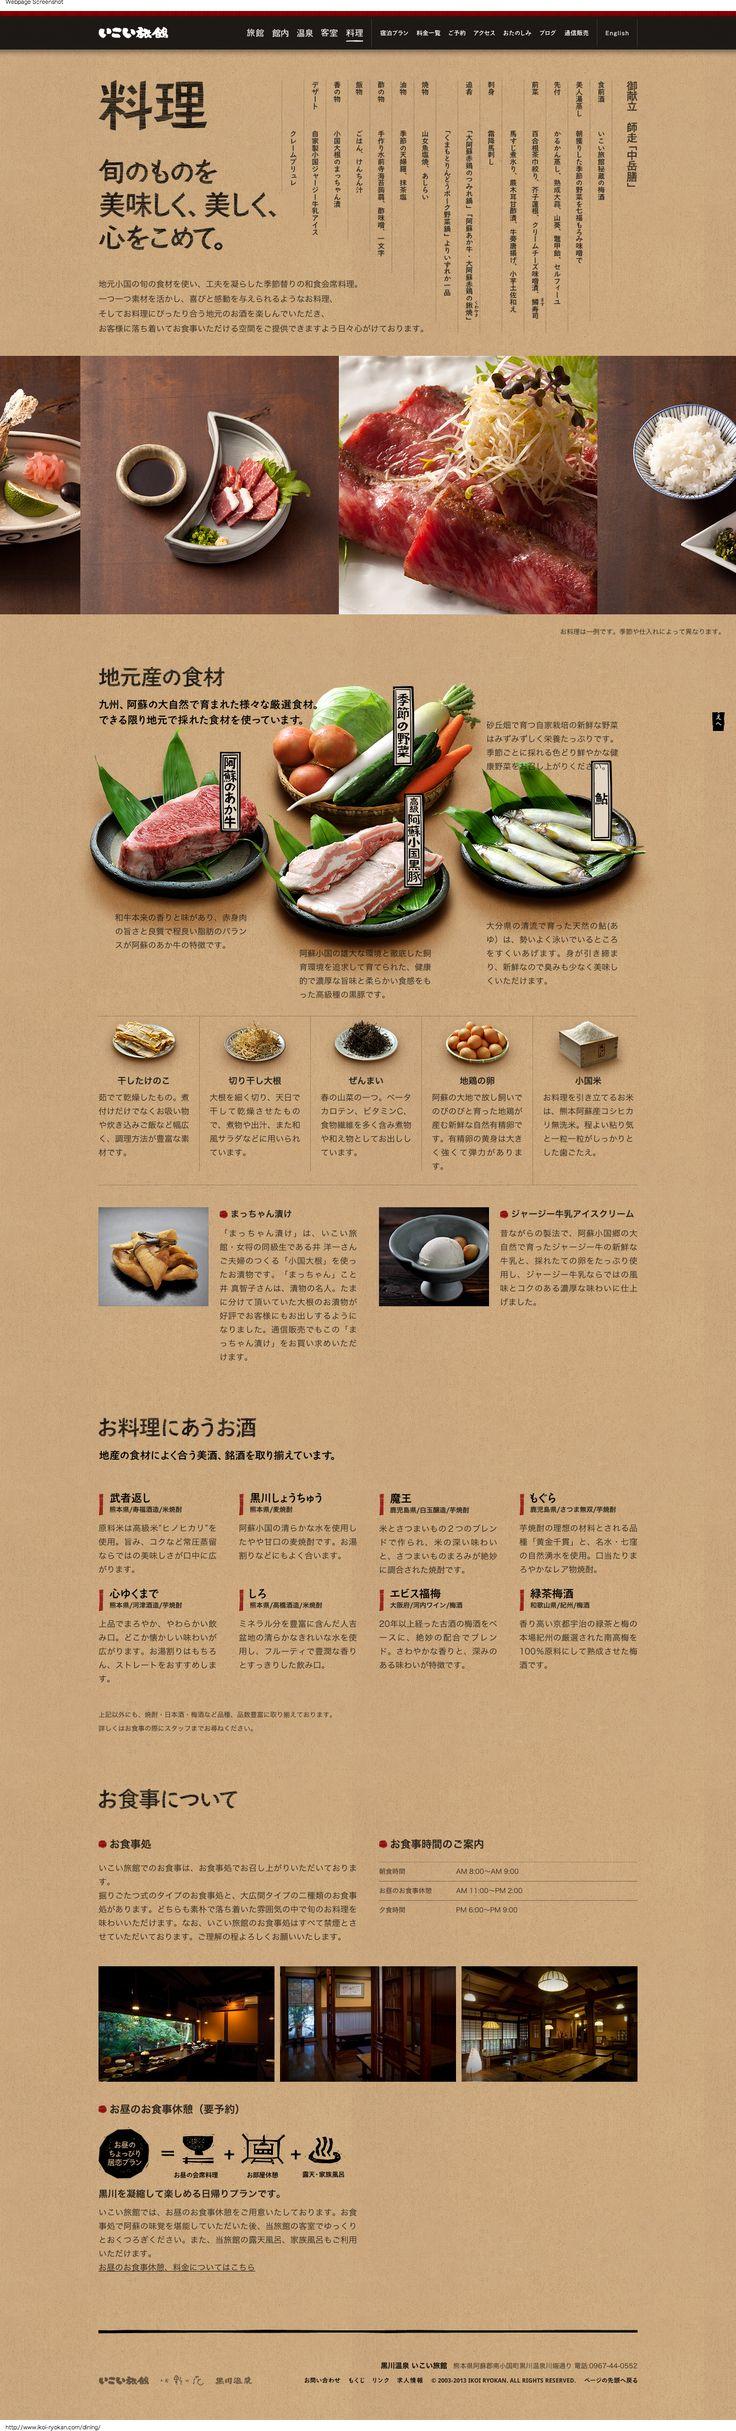 #webdesign #food